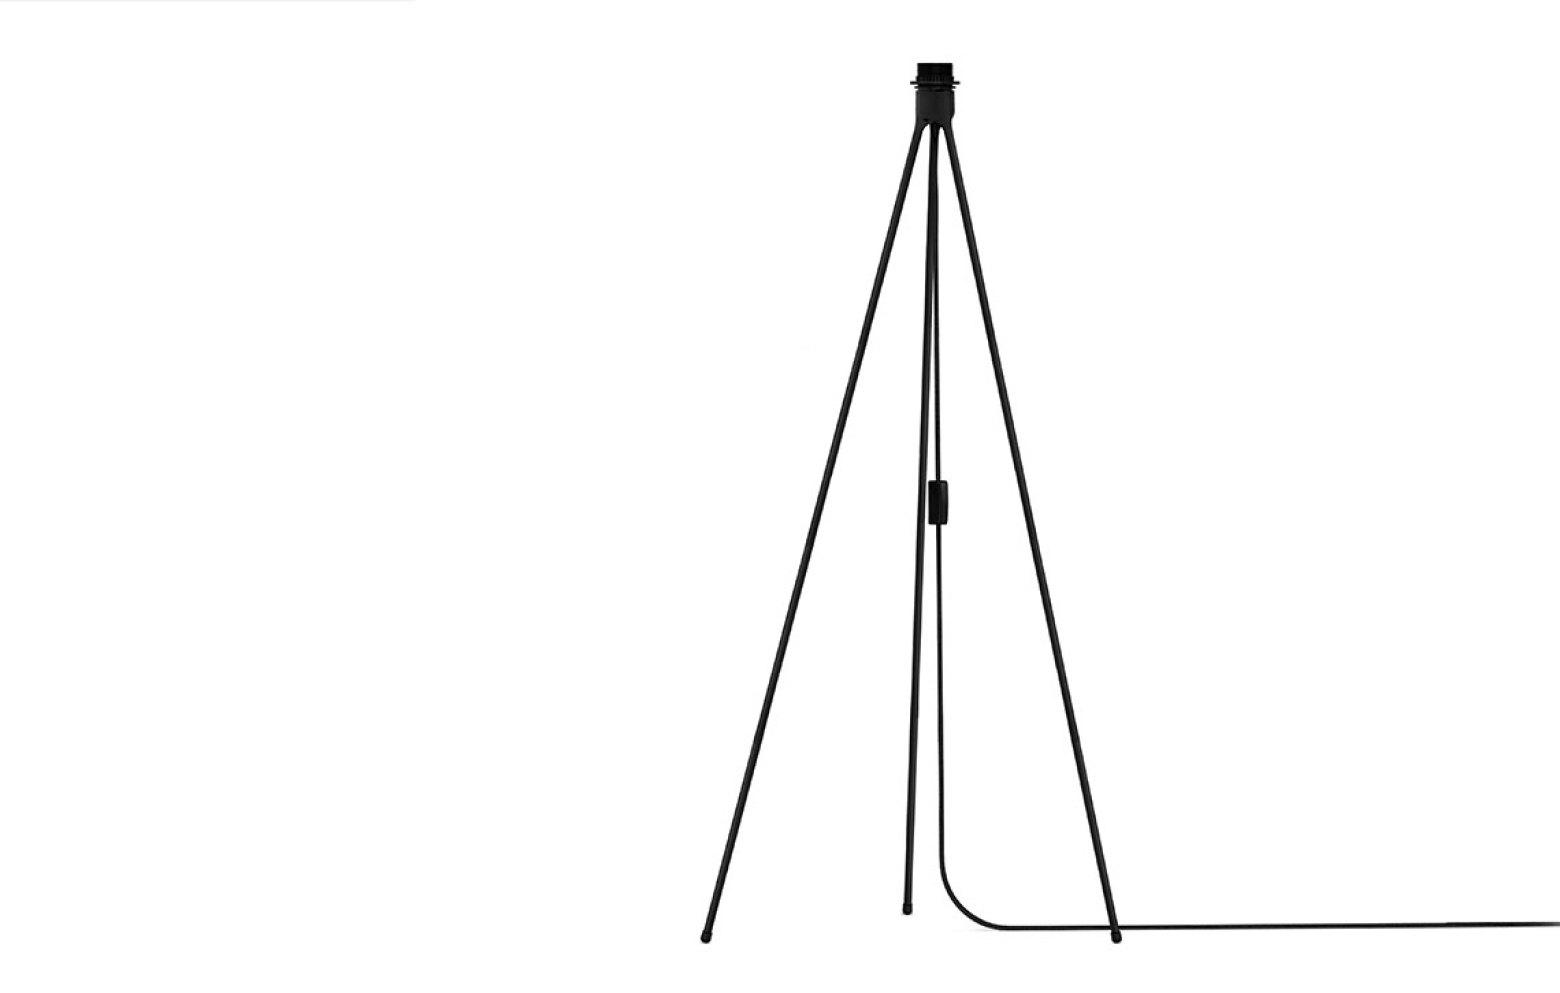 tripod lampen kleinm bel accessoires who 39 s perfect. Black Bedroom Furniture Sets. Home Design Ideas